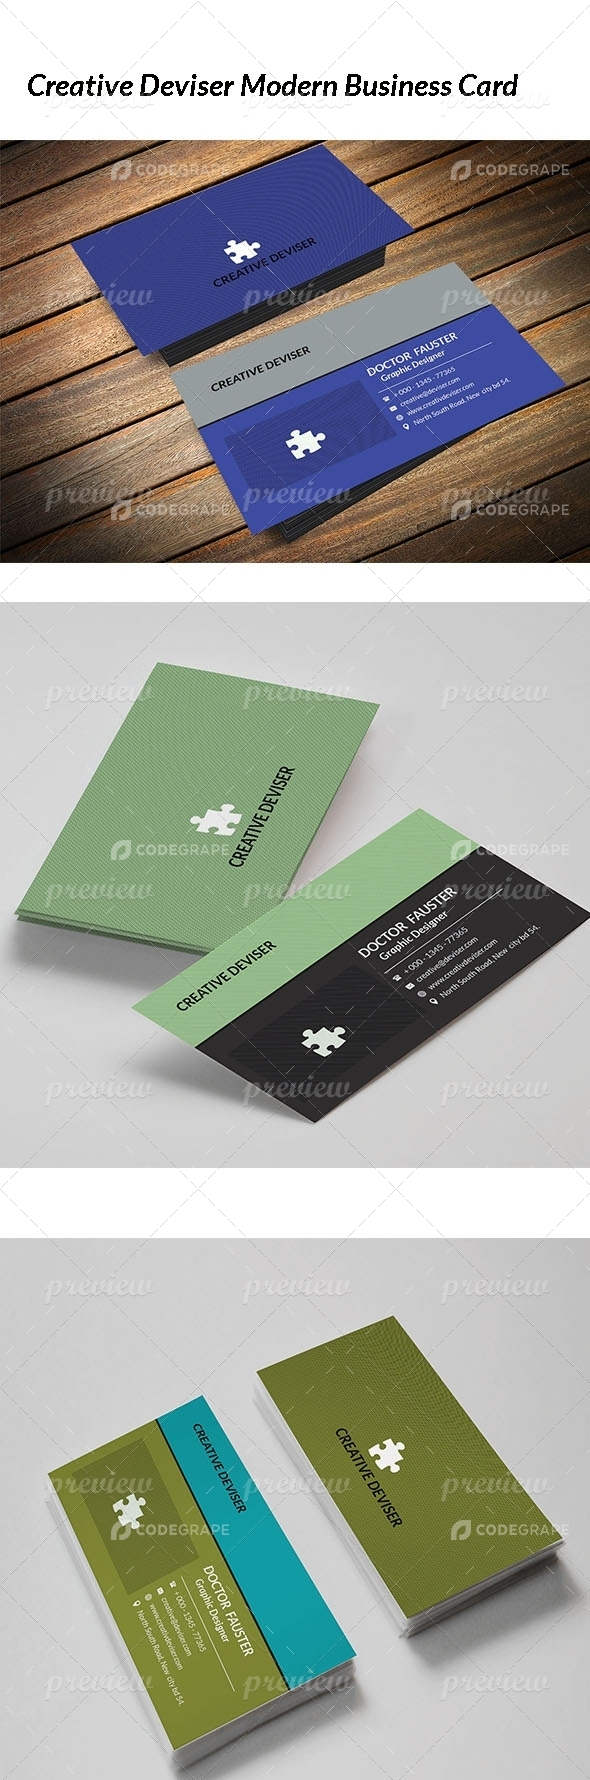 Creative Deviser Modern Business card